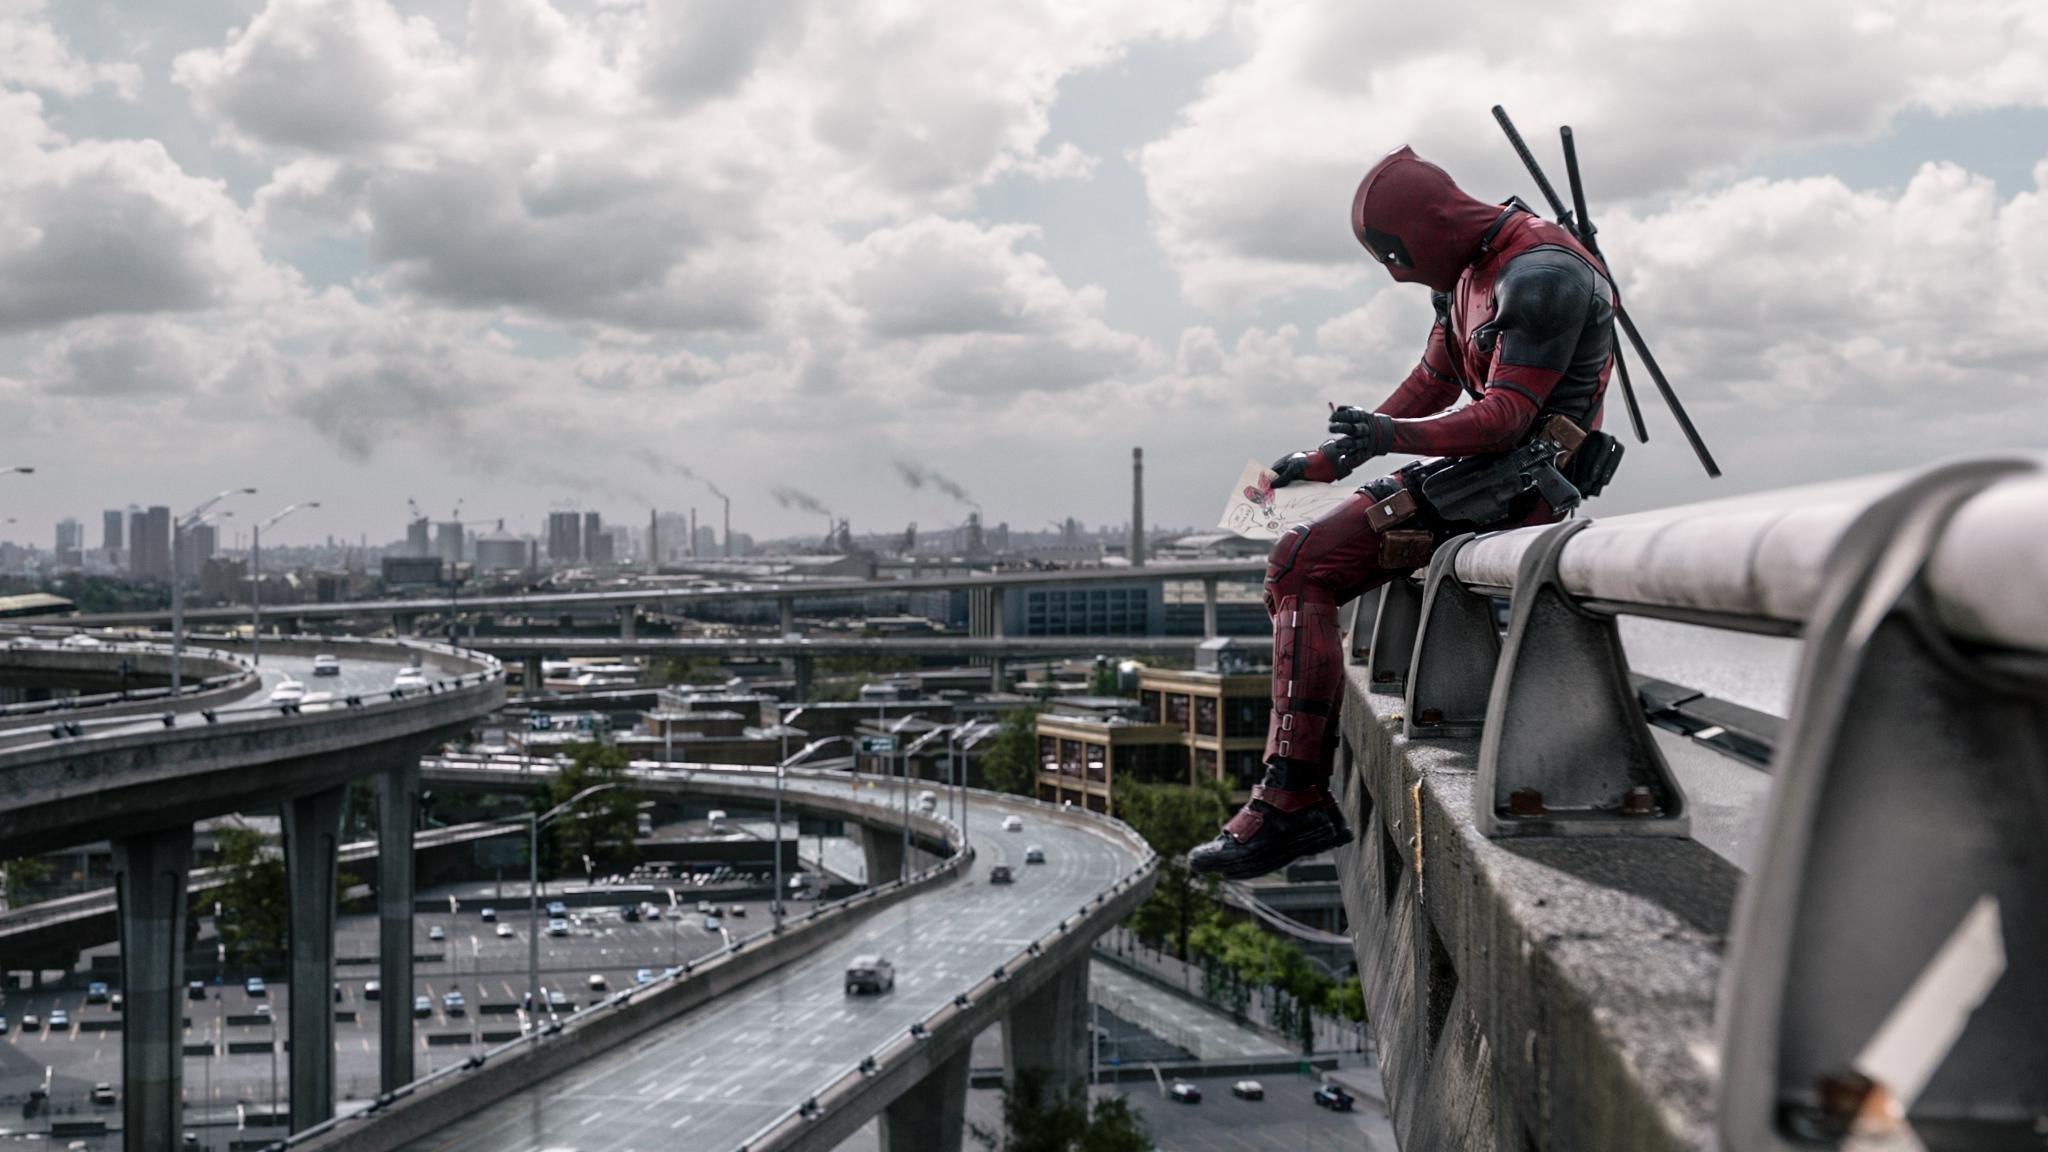 Most Inspiring Wallpaper Movie Deadpool - deadpool-drawing-art-image  HD_40483.jpg